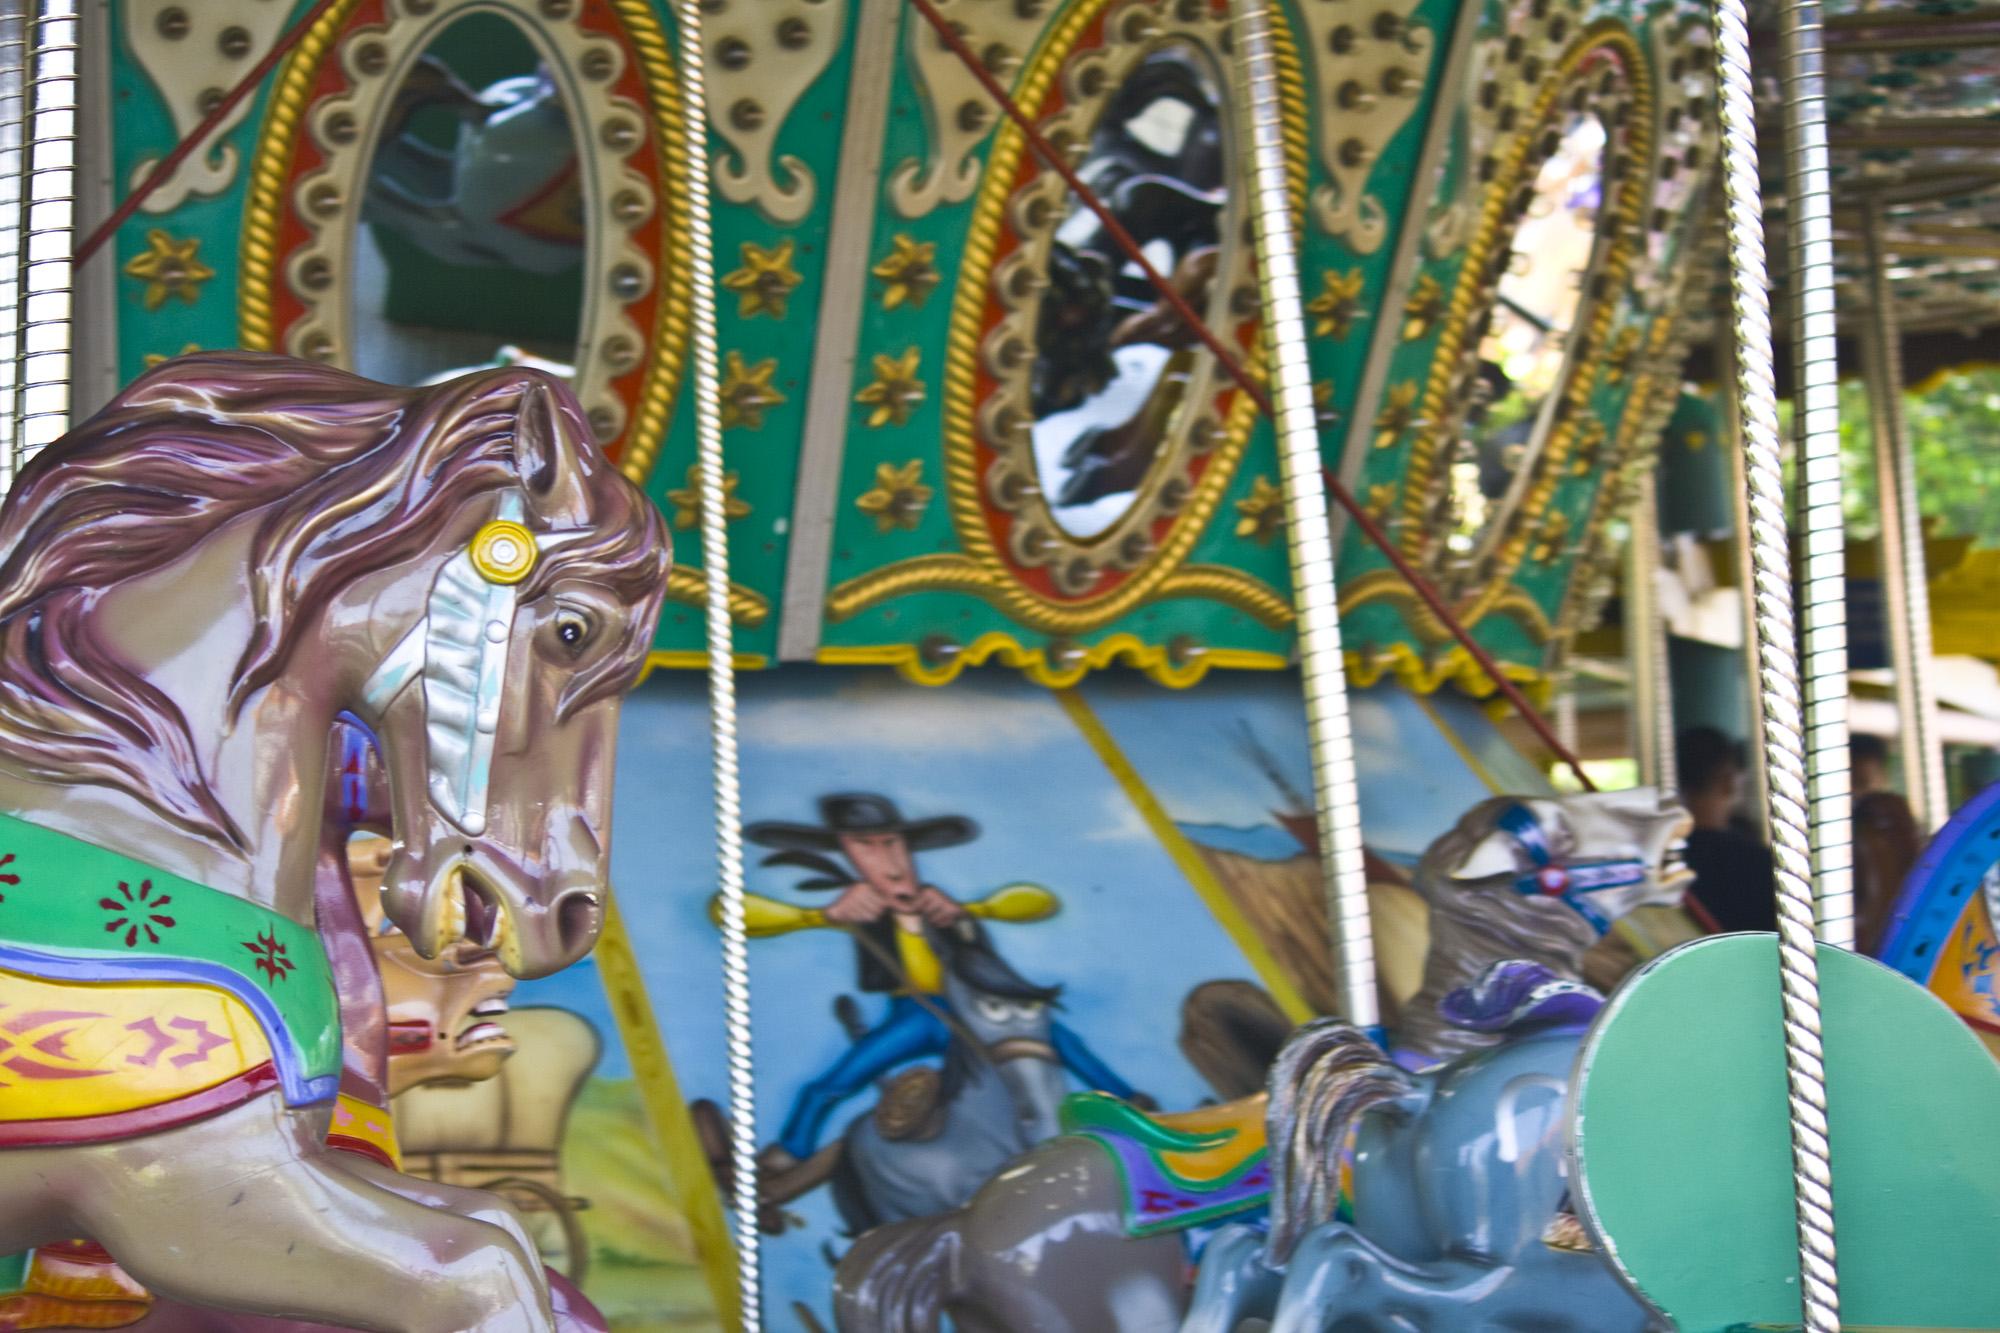 Carousel theme park photo